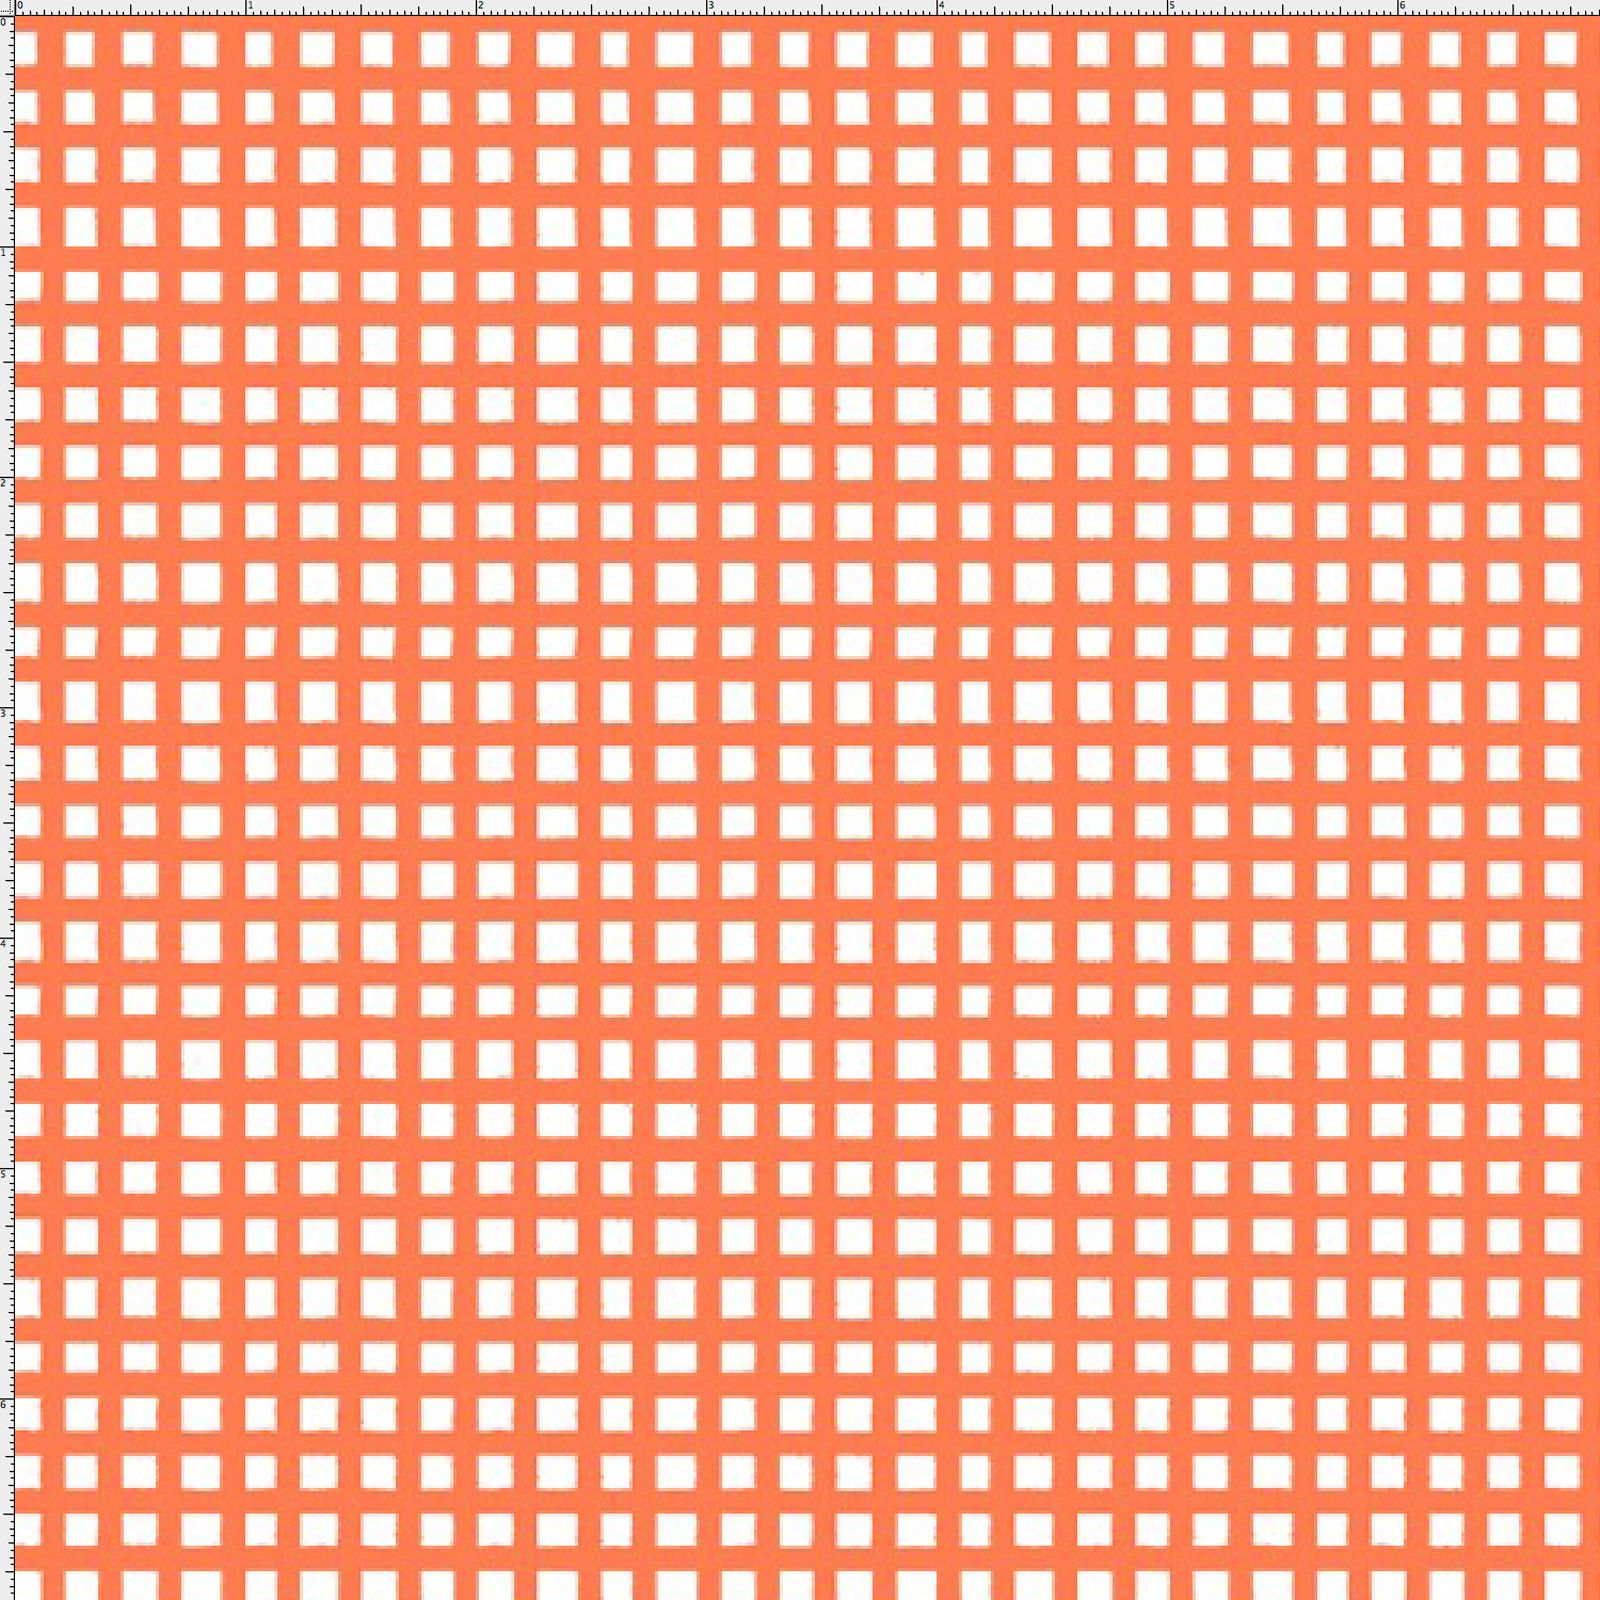 Chipper Check Orange Fabric Yard